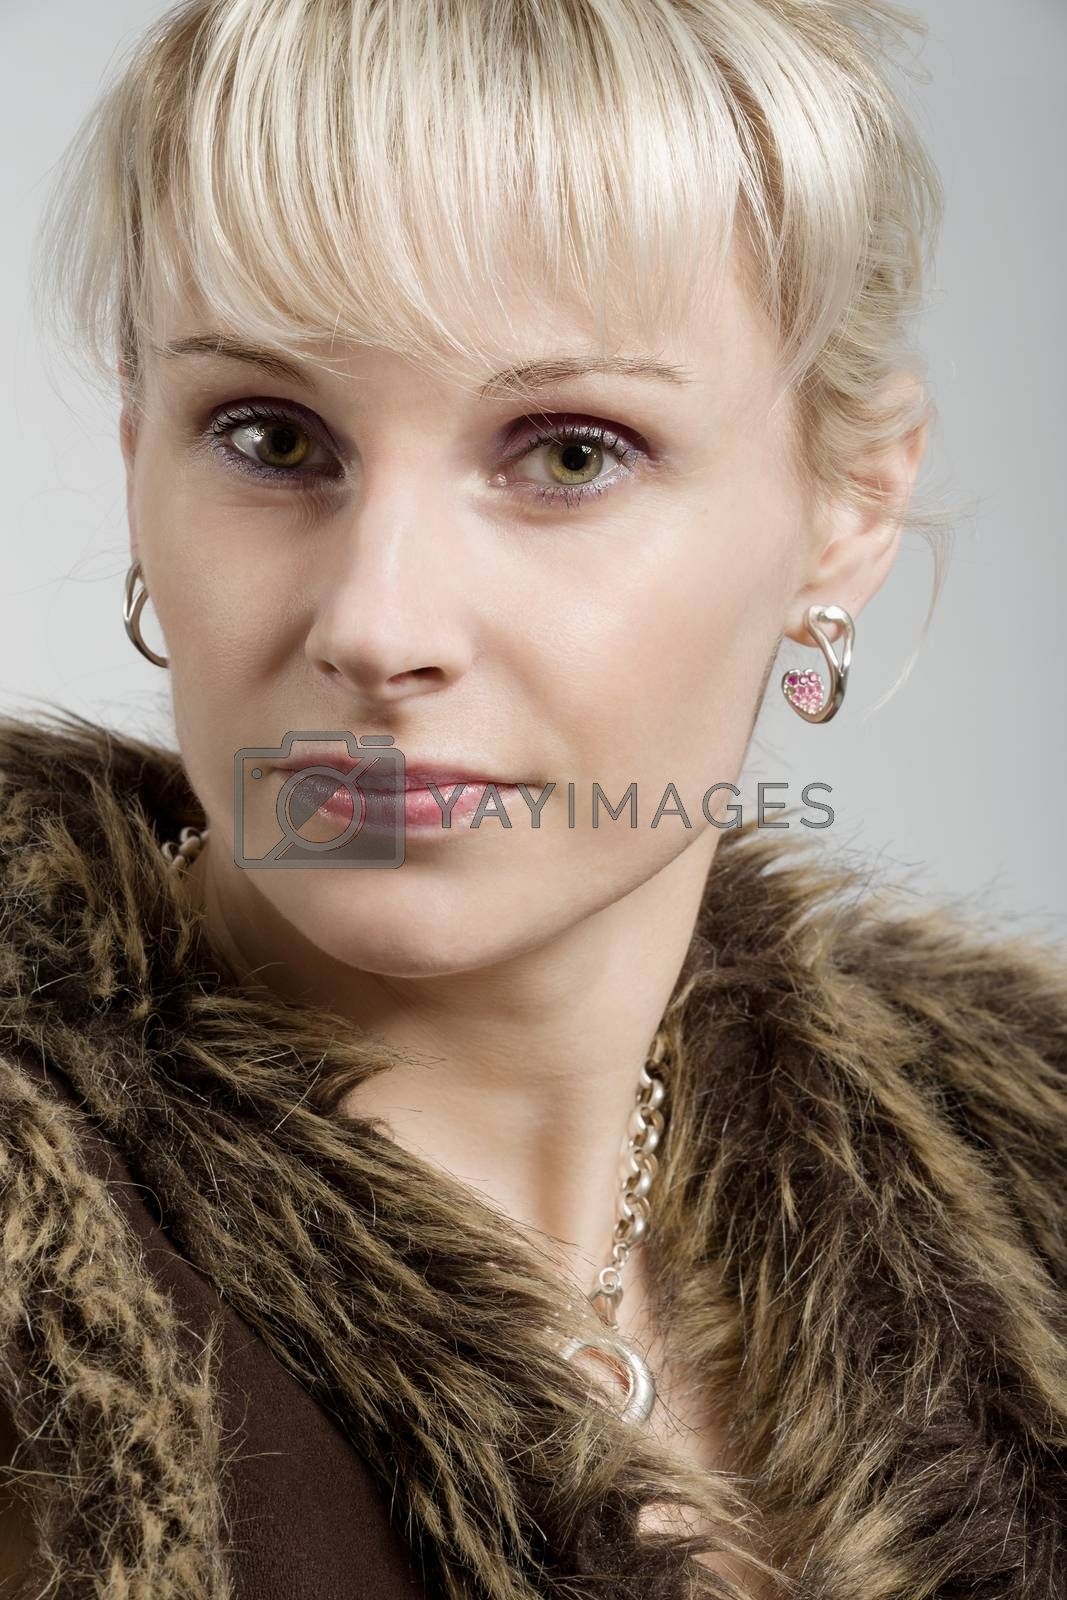 Royalty free image of studio portrait of beautiful woman by artush